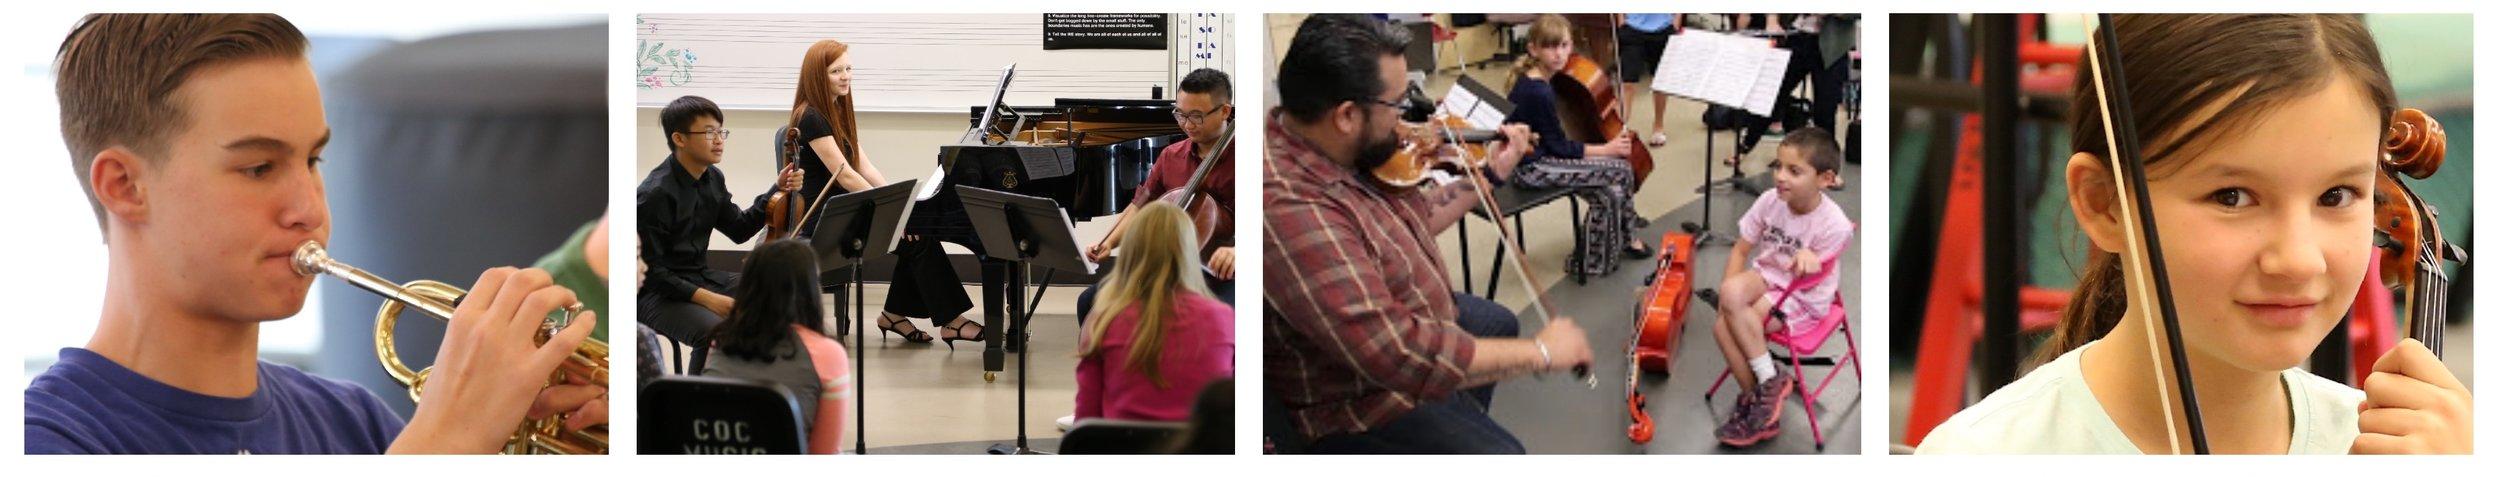 rehearsal '19 1b.jpg